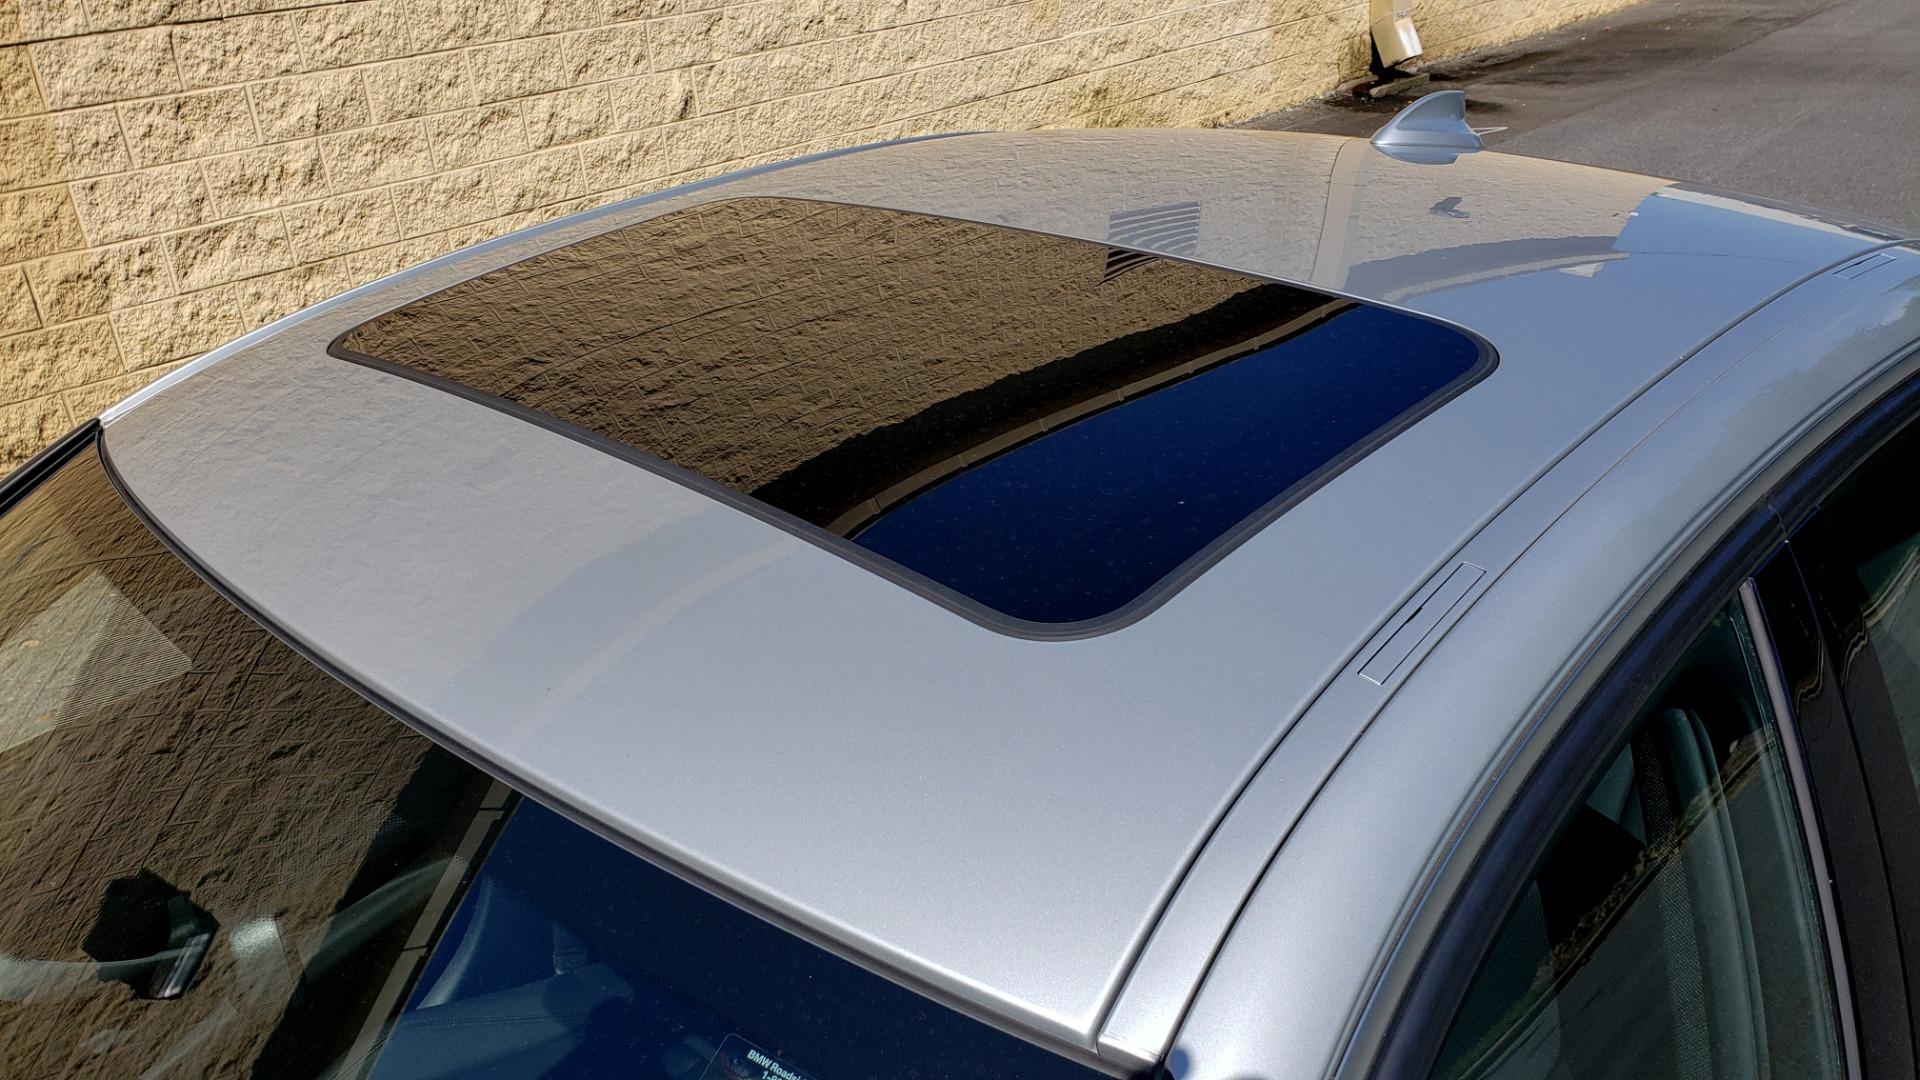 Used 2017 BMW 3 SERIES 330I SPORT SEDAN / DRVR ASST PKG / SUNROOF / REARVIEW for sale Sold at Formula Imports in Charlotte NC 28227 8